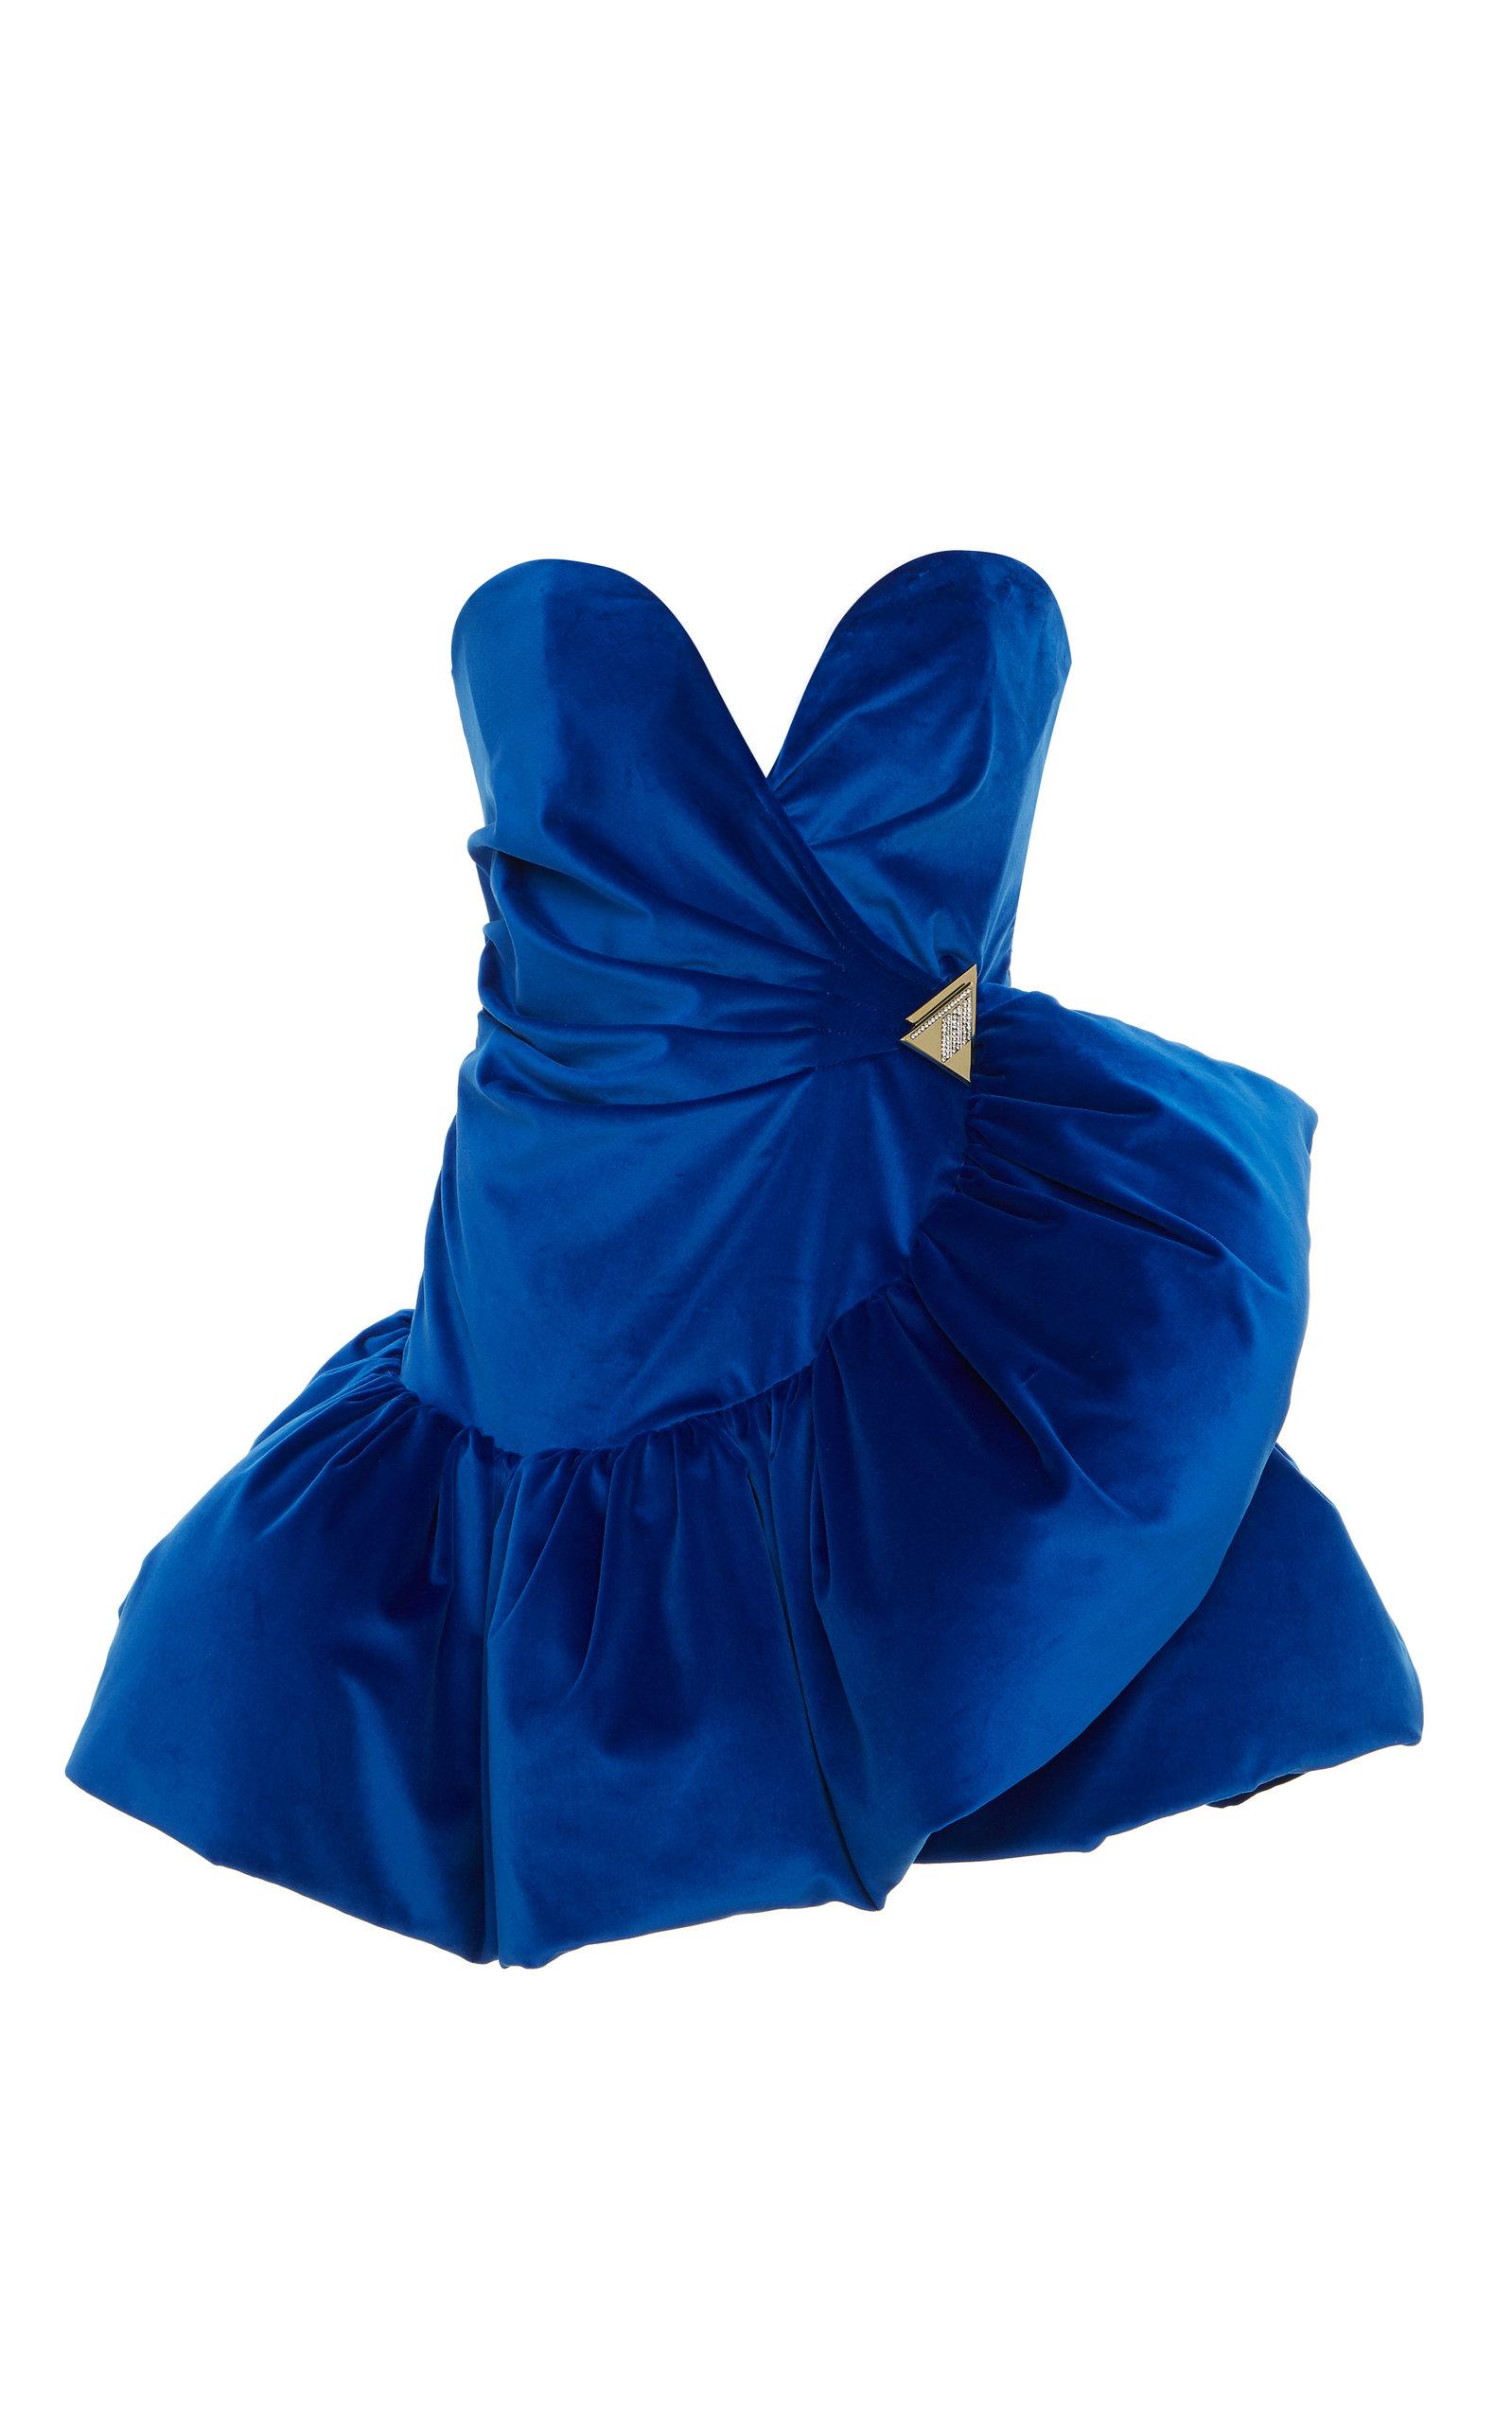 Buy The Attico Ruffled Velvet Mini Dress online, shop The Attico at the best price